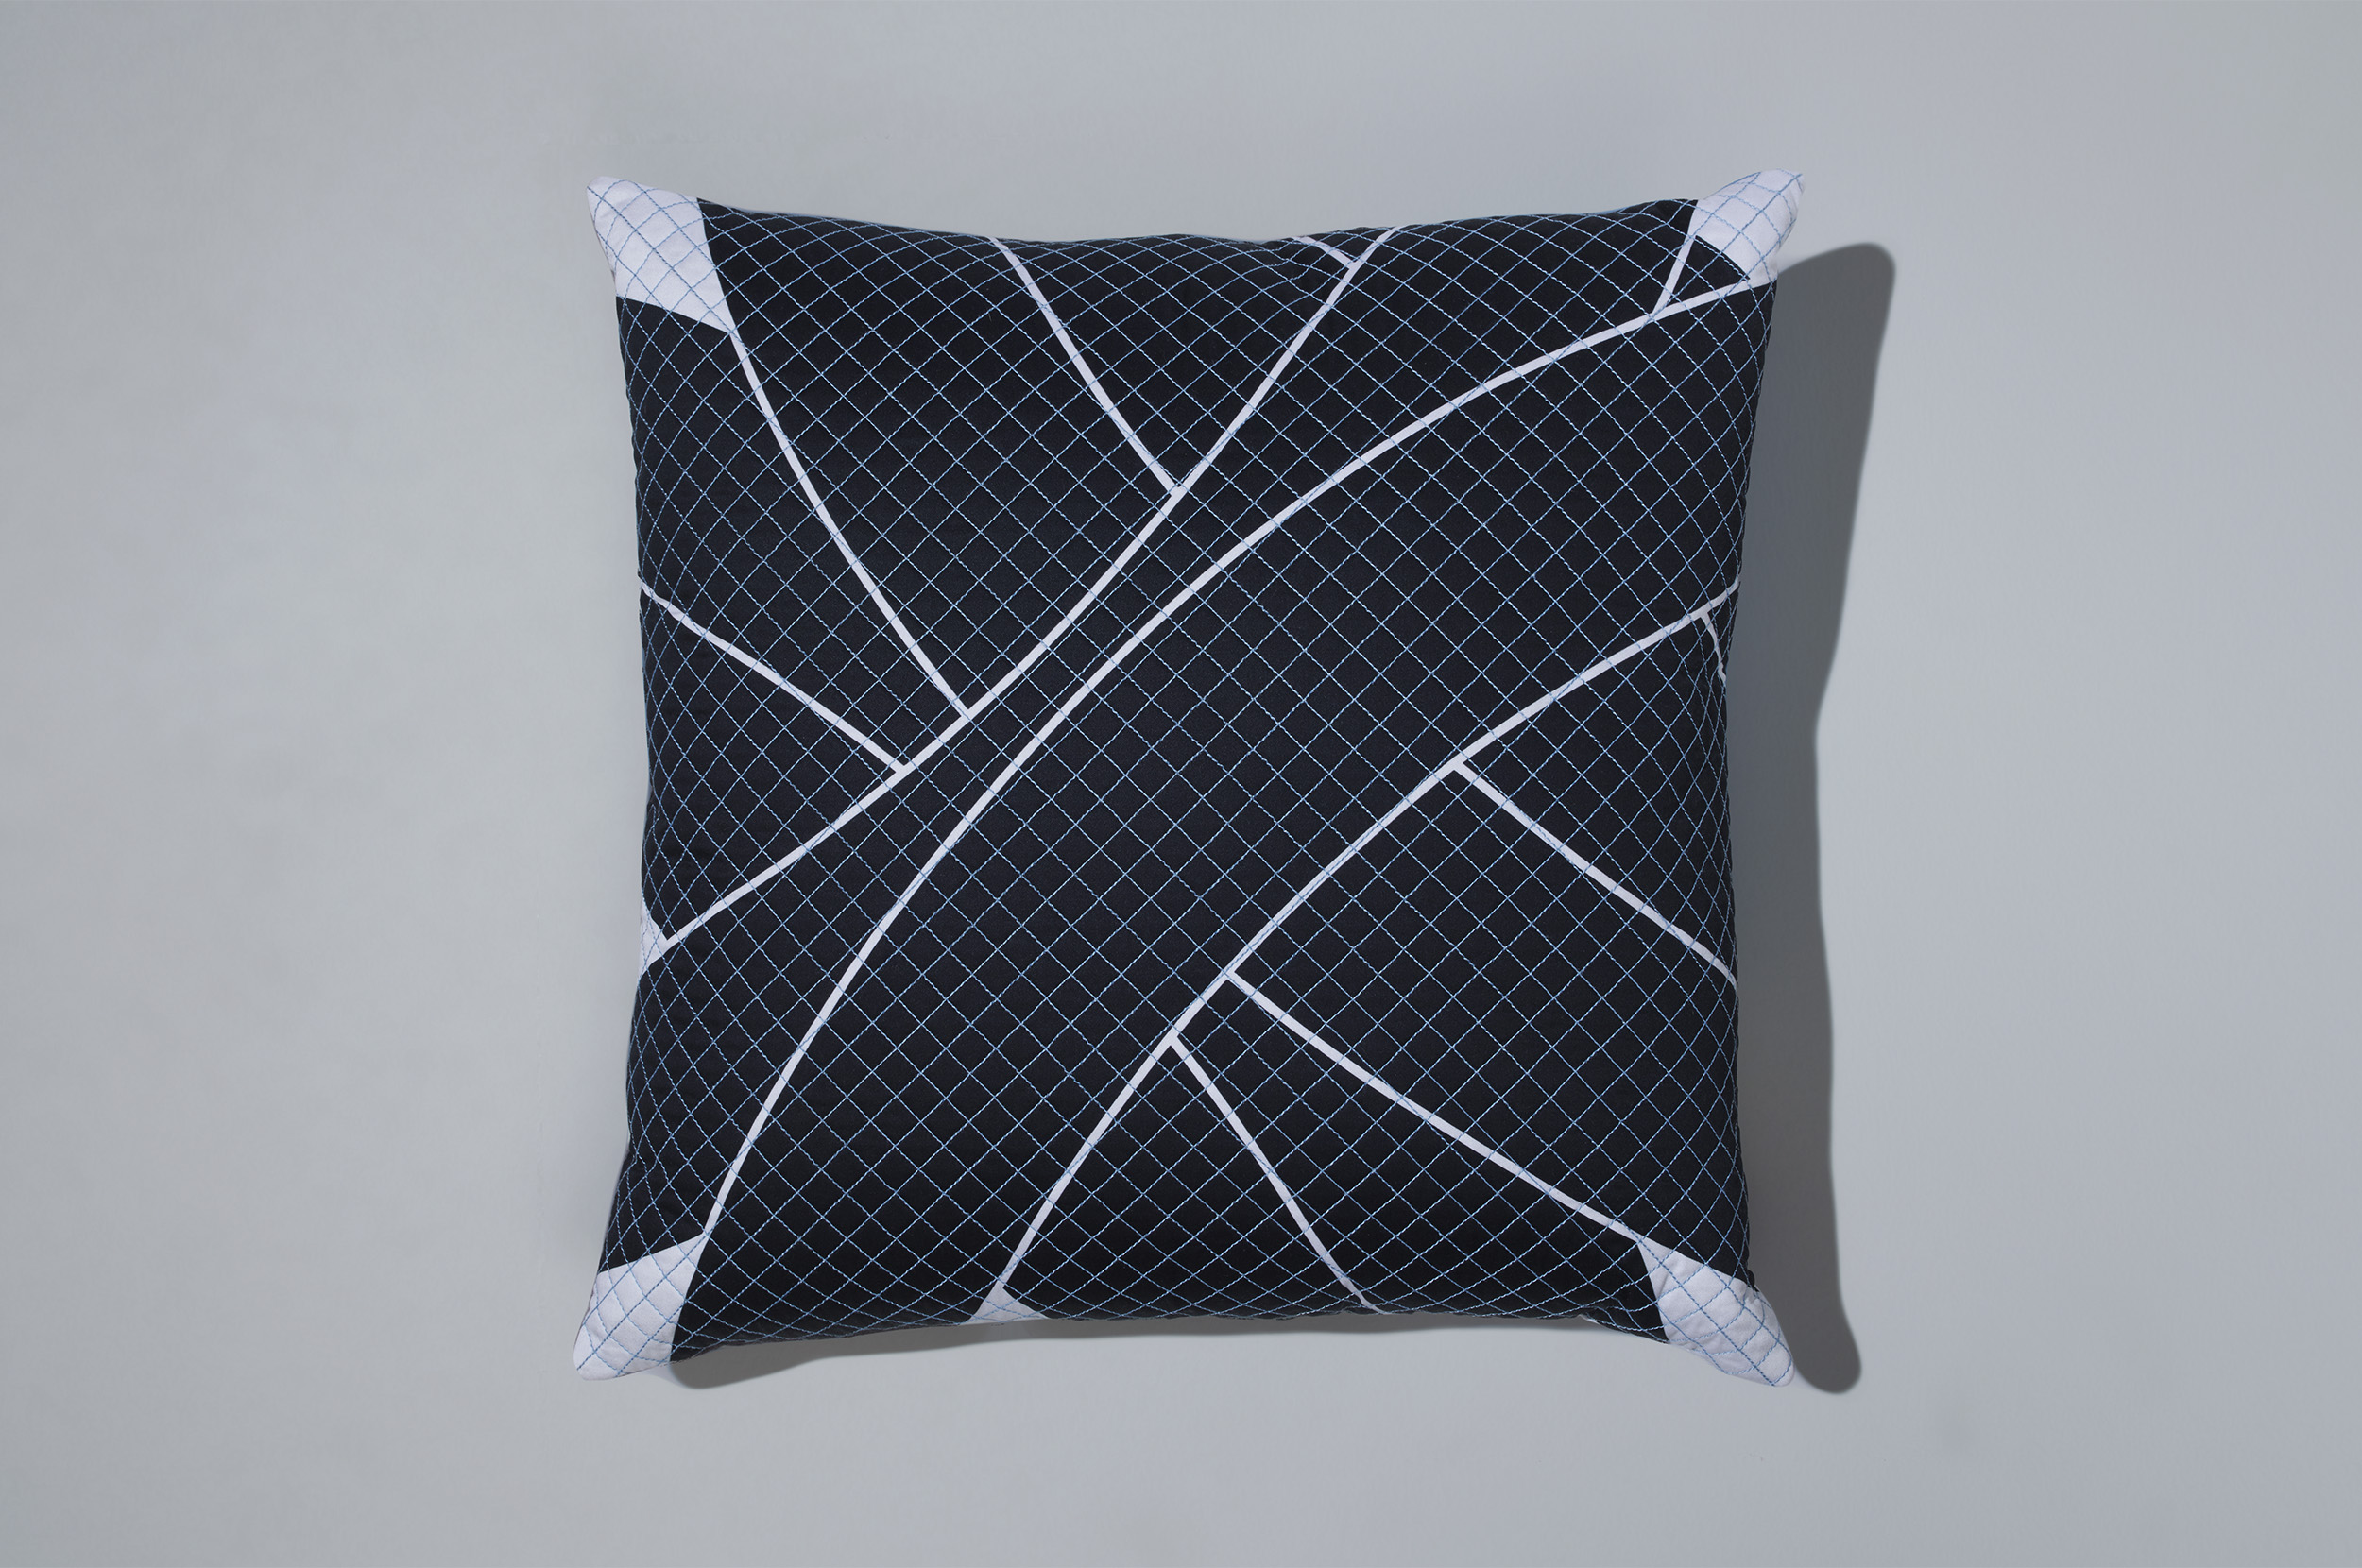 PostAndGleam_Pillows_BlackWhiteBlue_COMP_Oa_FL_2500.JPG